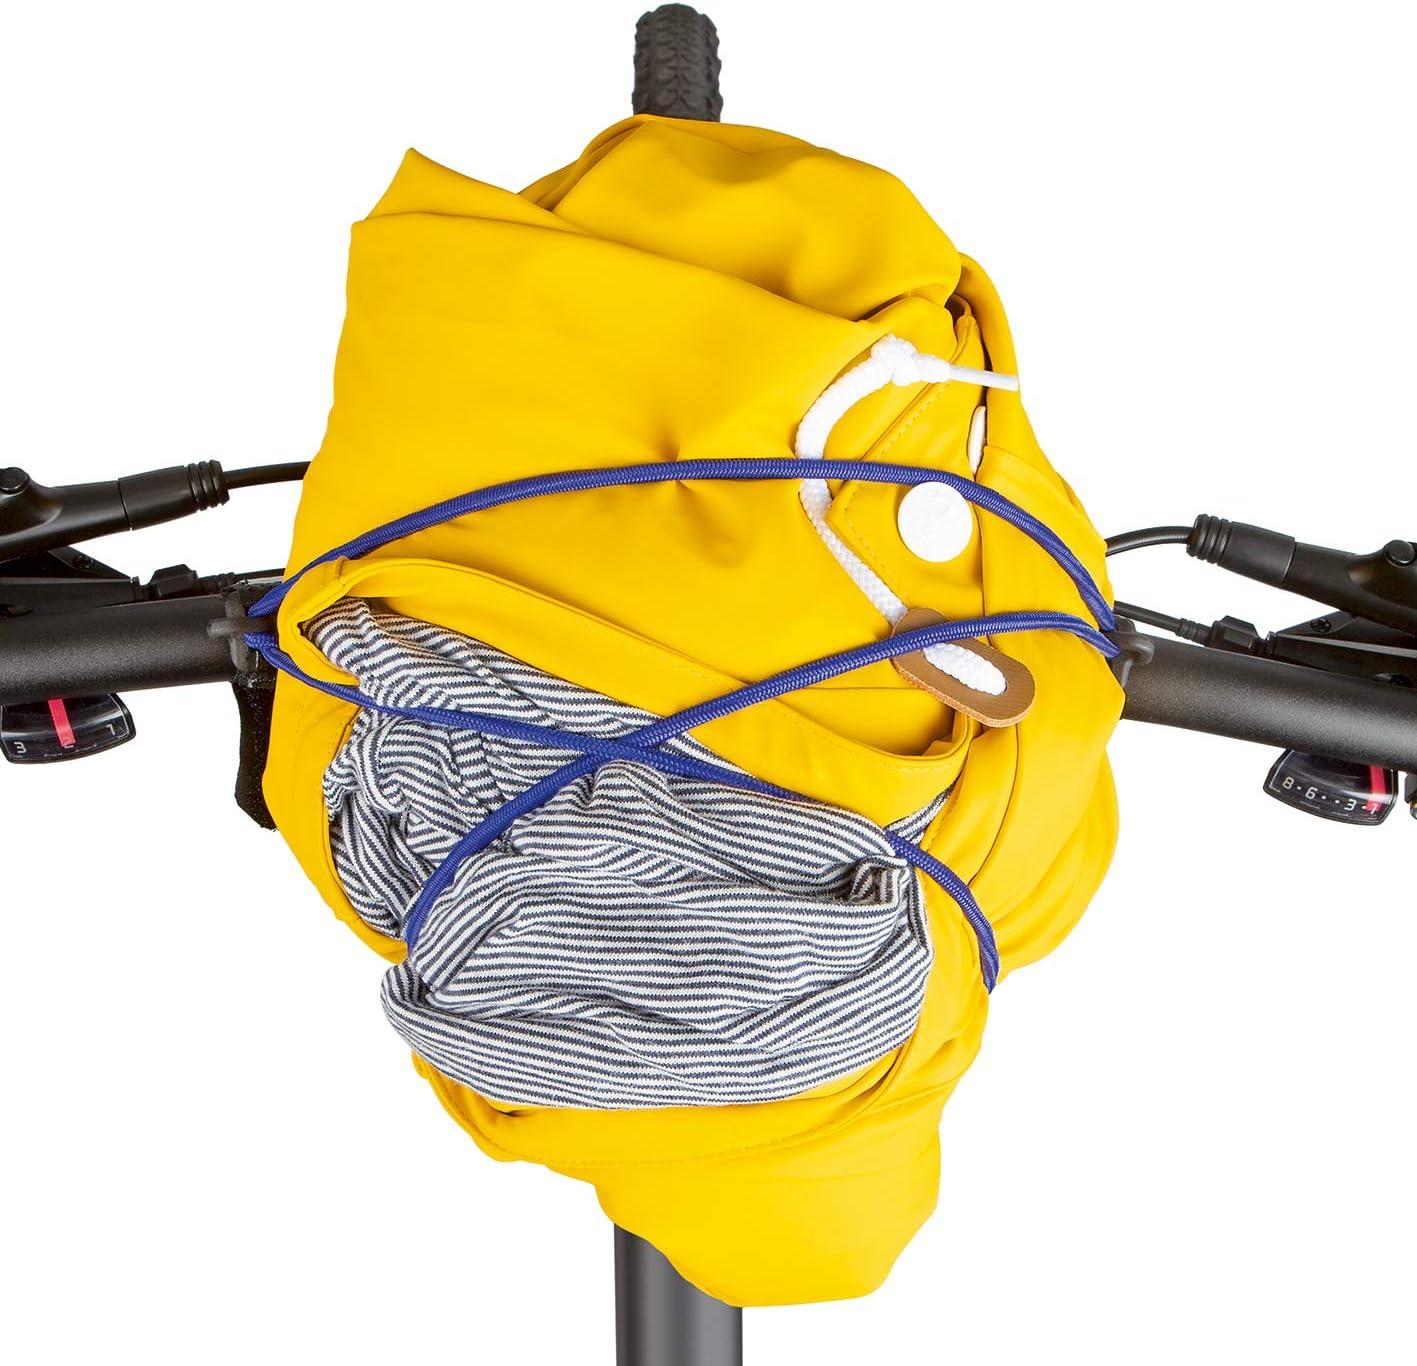 Spanngummi Gep/äckspanner Elastisches Gummiband Fahrradlenker Klettverschluss carryyygum Lenkerspannband 105cm Mini-Gep/äcktr/äger f